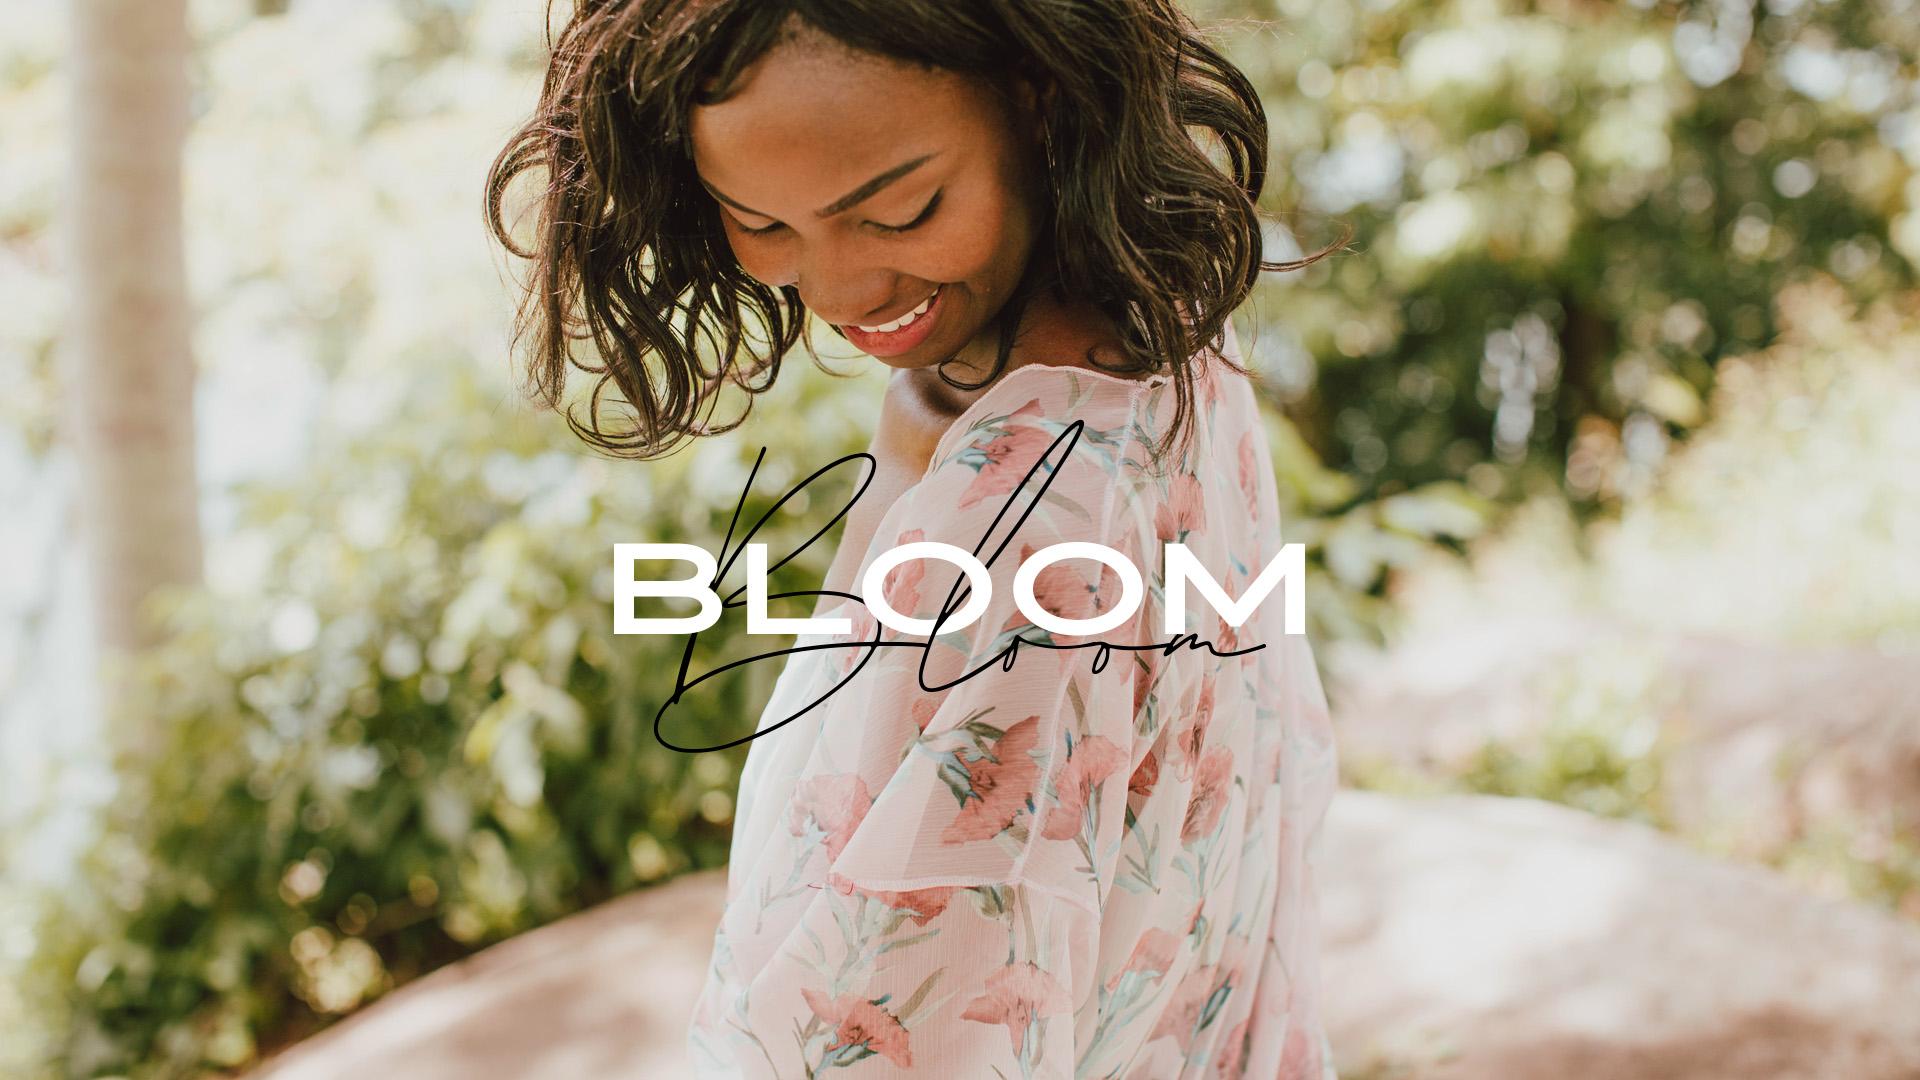 Bloom Front LB.jpg